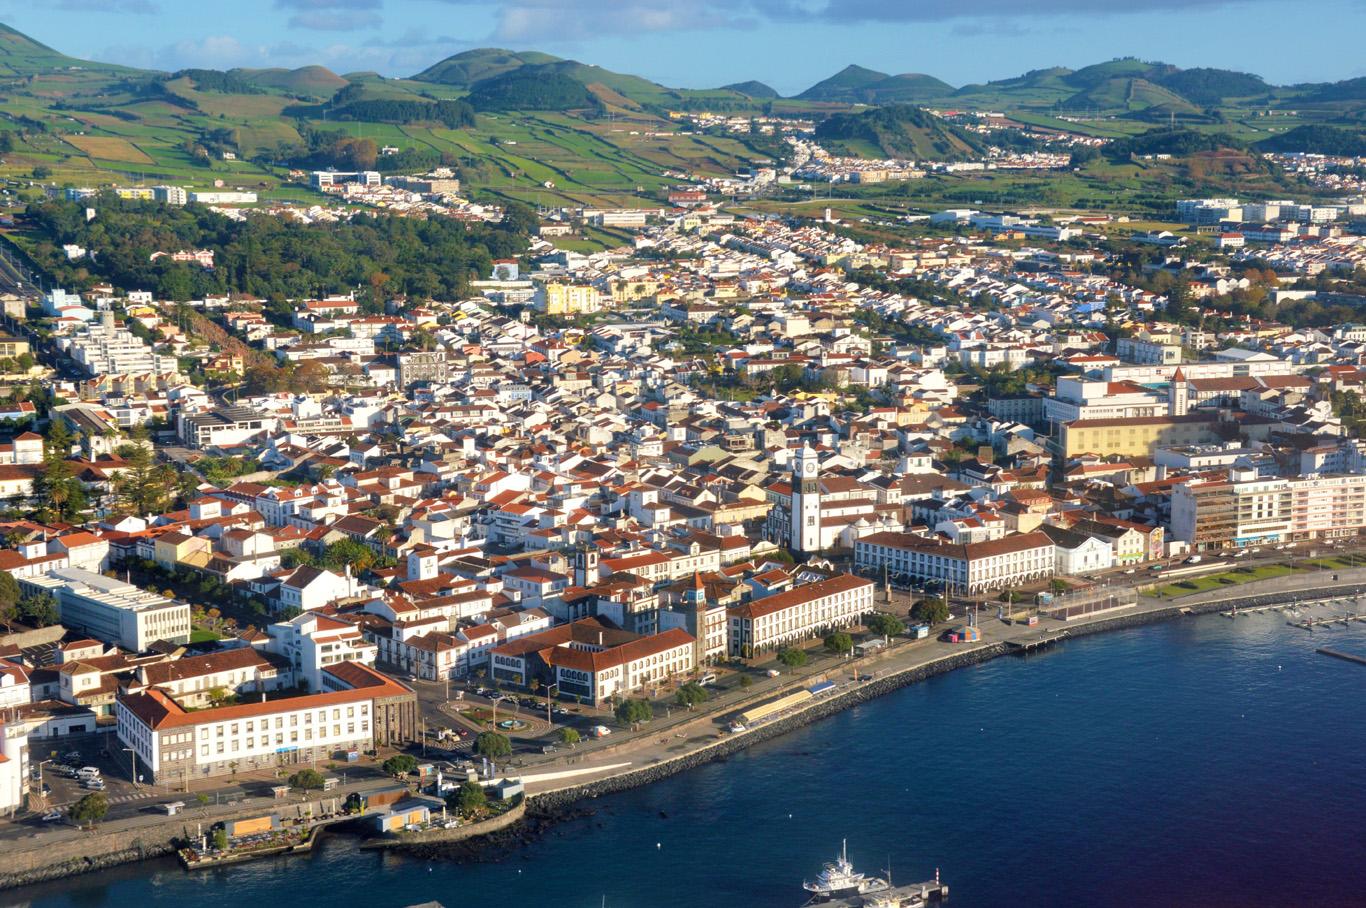 Ponta Delgada minutes before landing